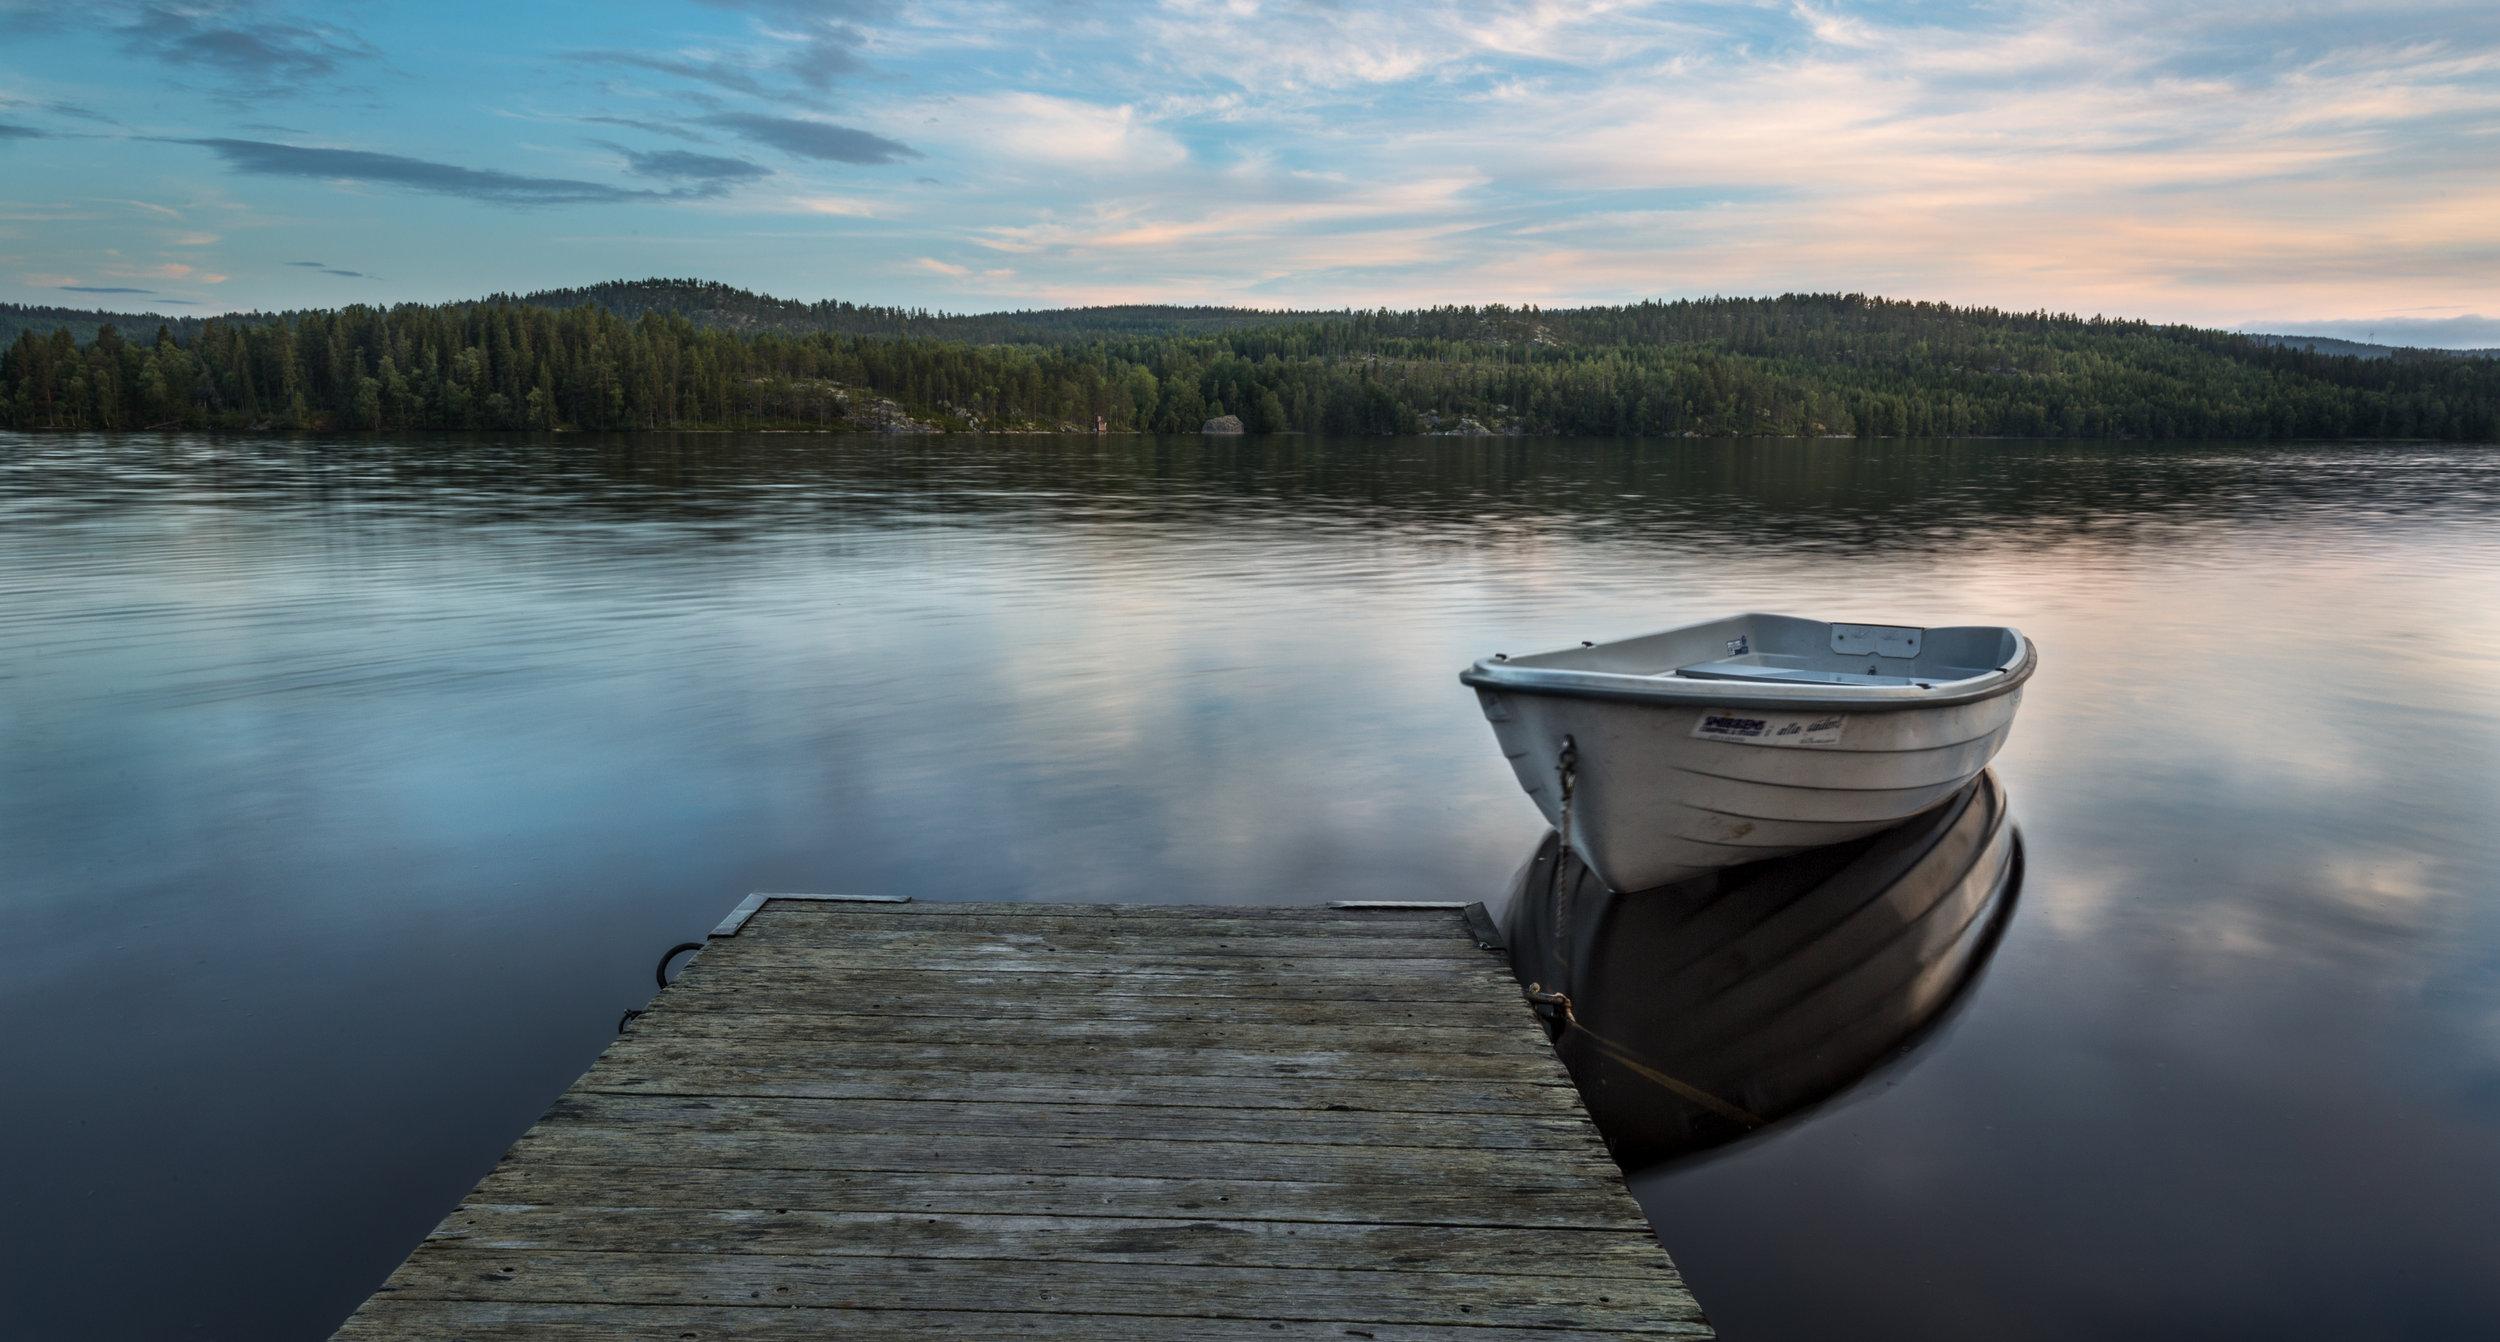 Alone on the Calm Lake